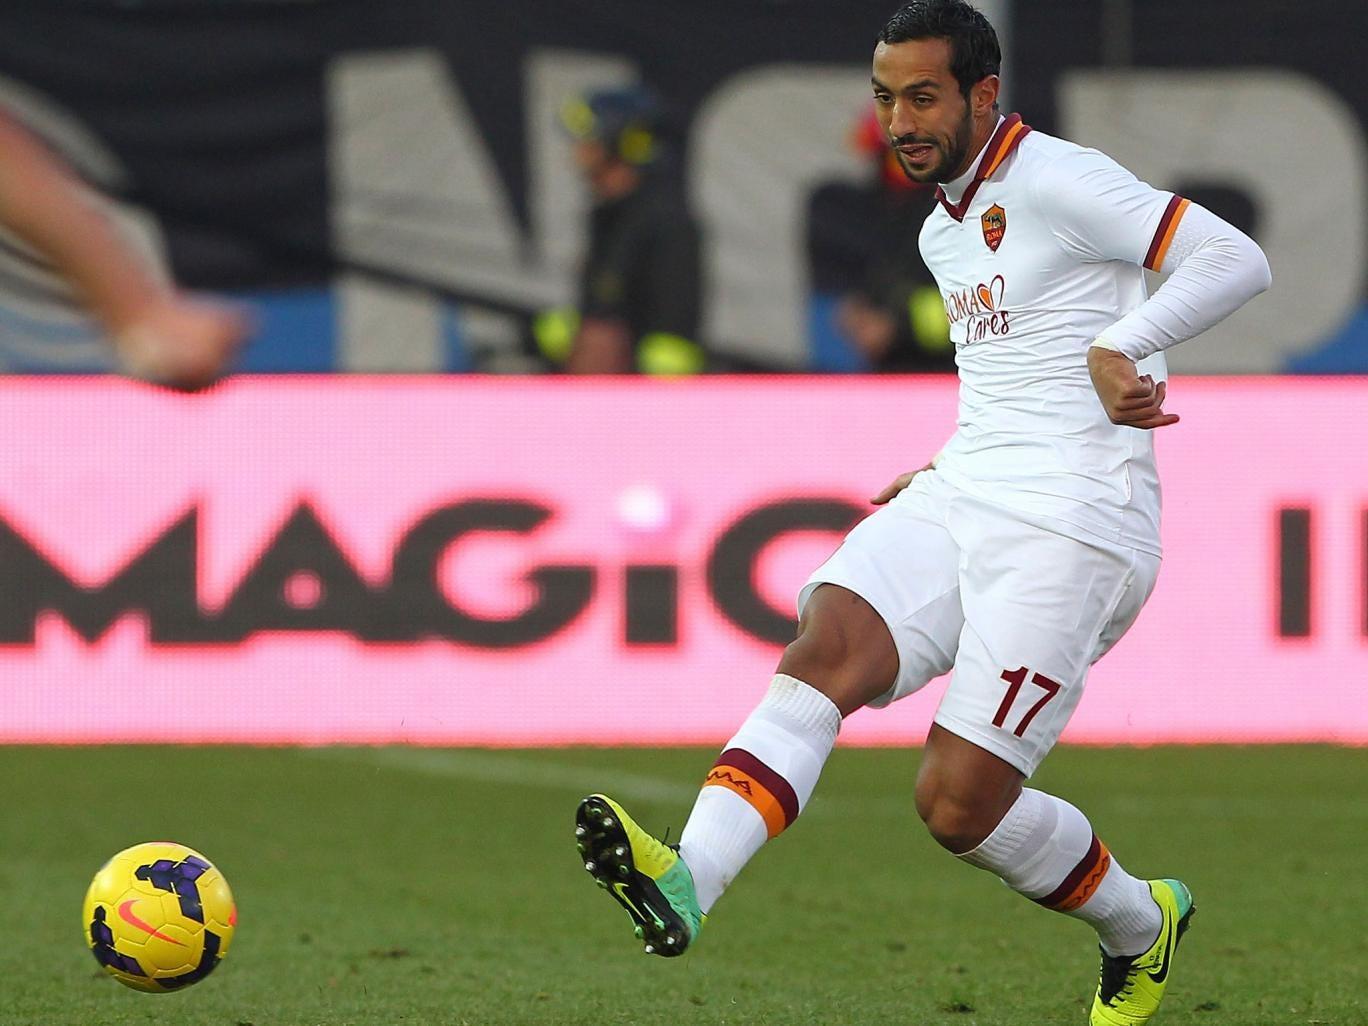 Mehdi Benatia of AS Roma in action